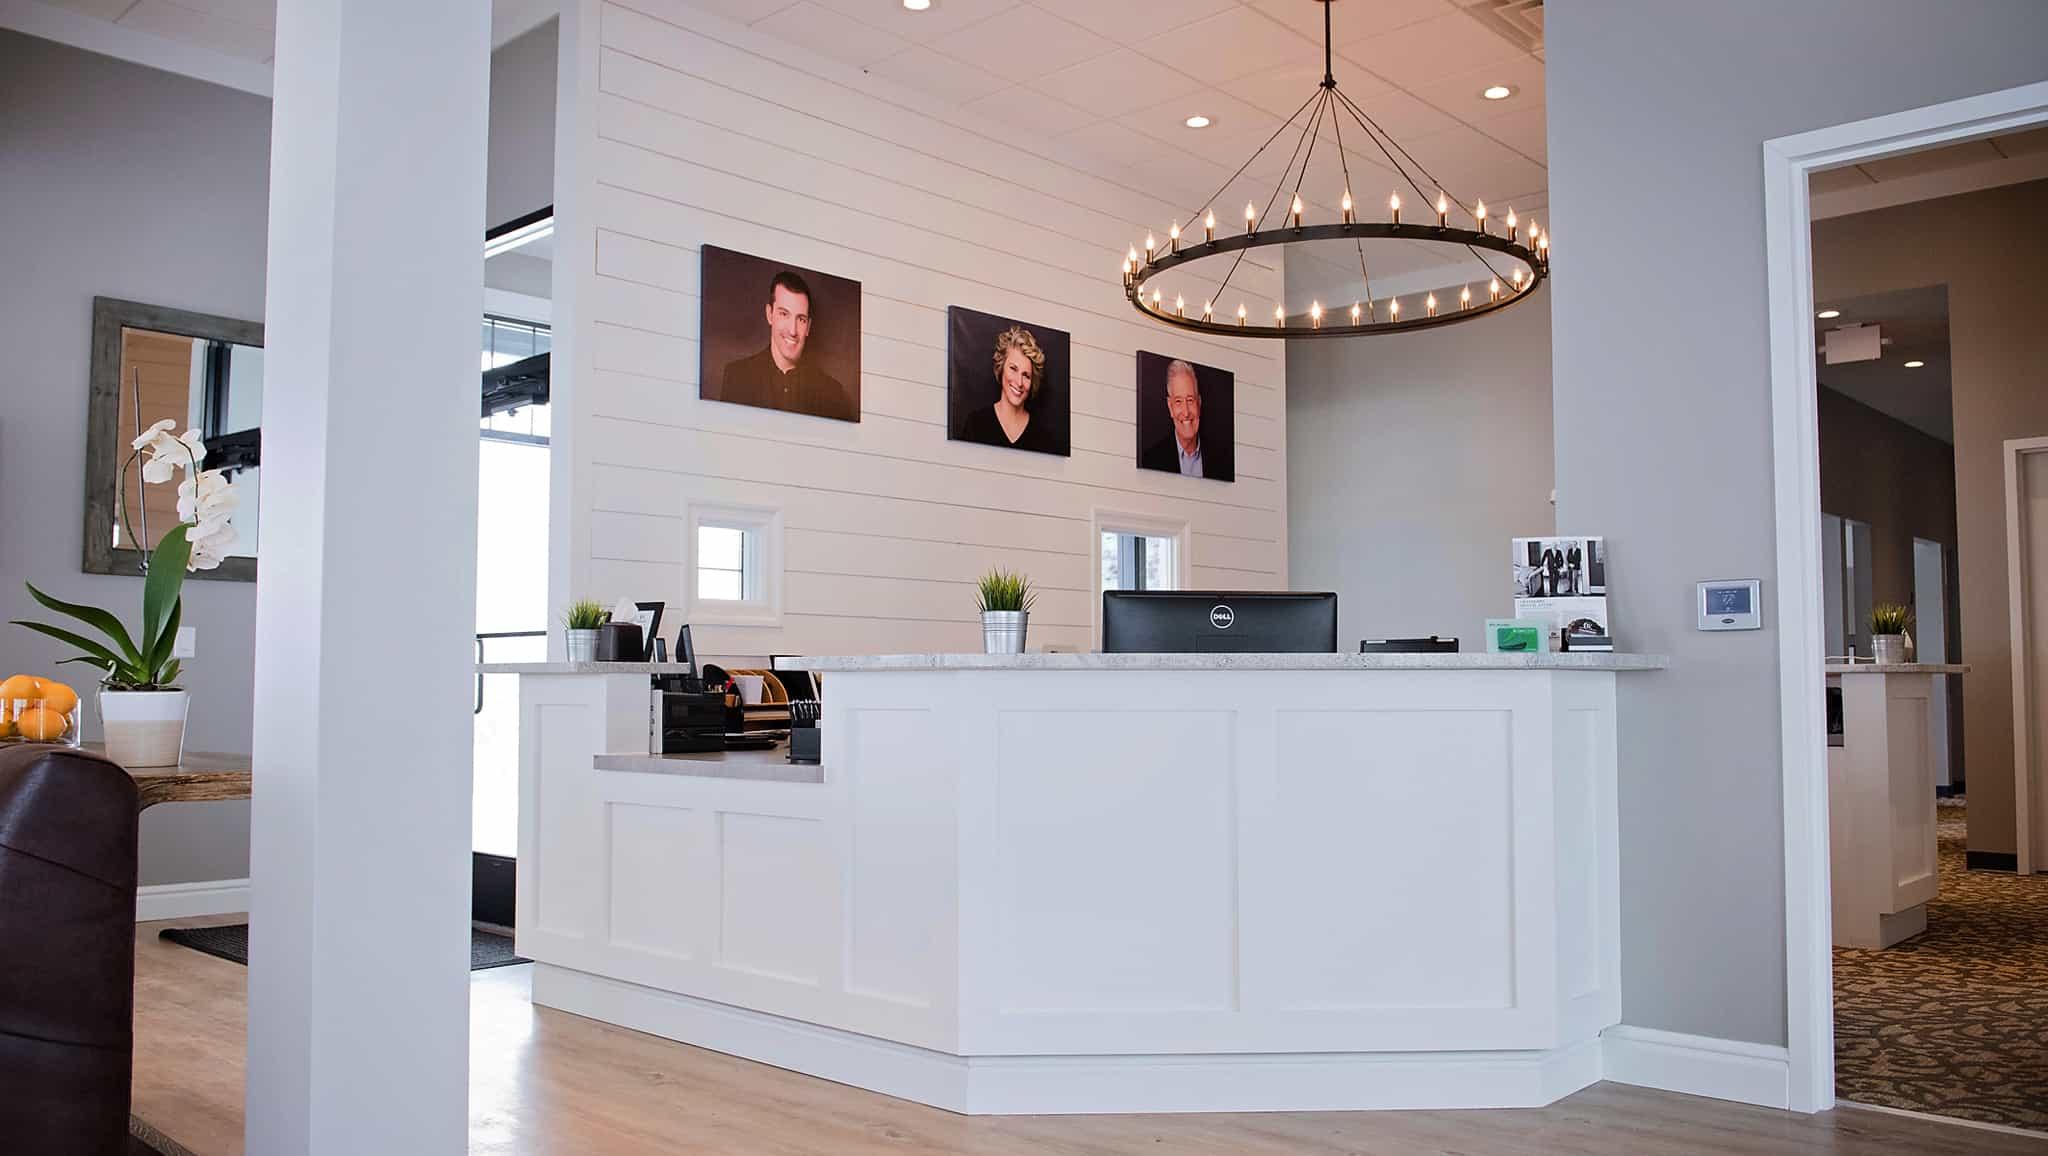 Cranberry Dental Studio waiting room